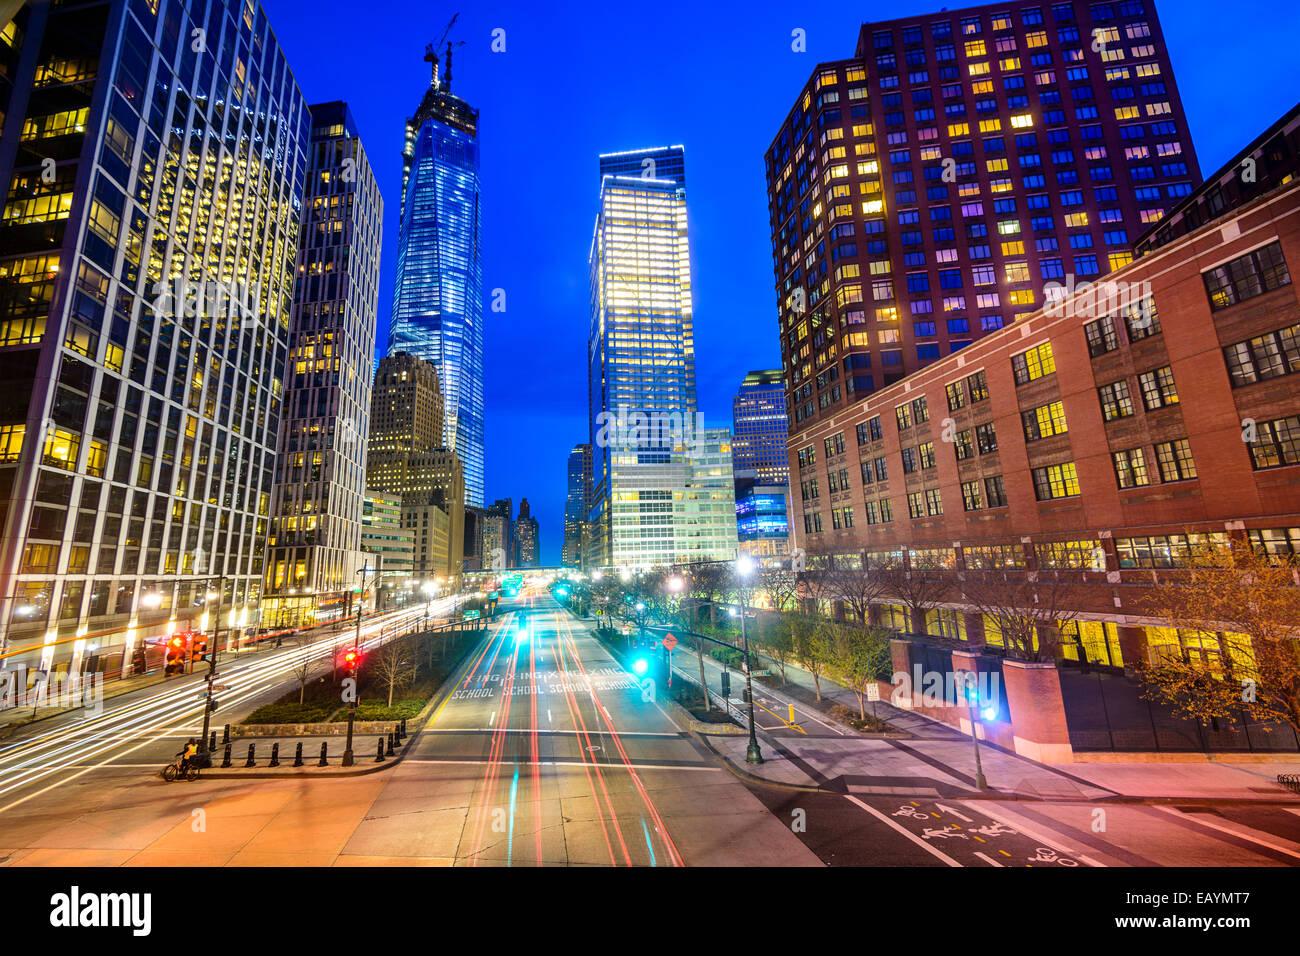 New York Ville paysage urbain dans le Lower Manhattan. Photo Stock